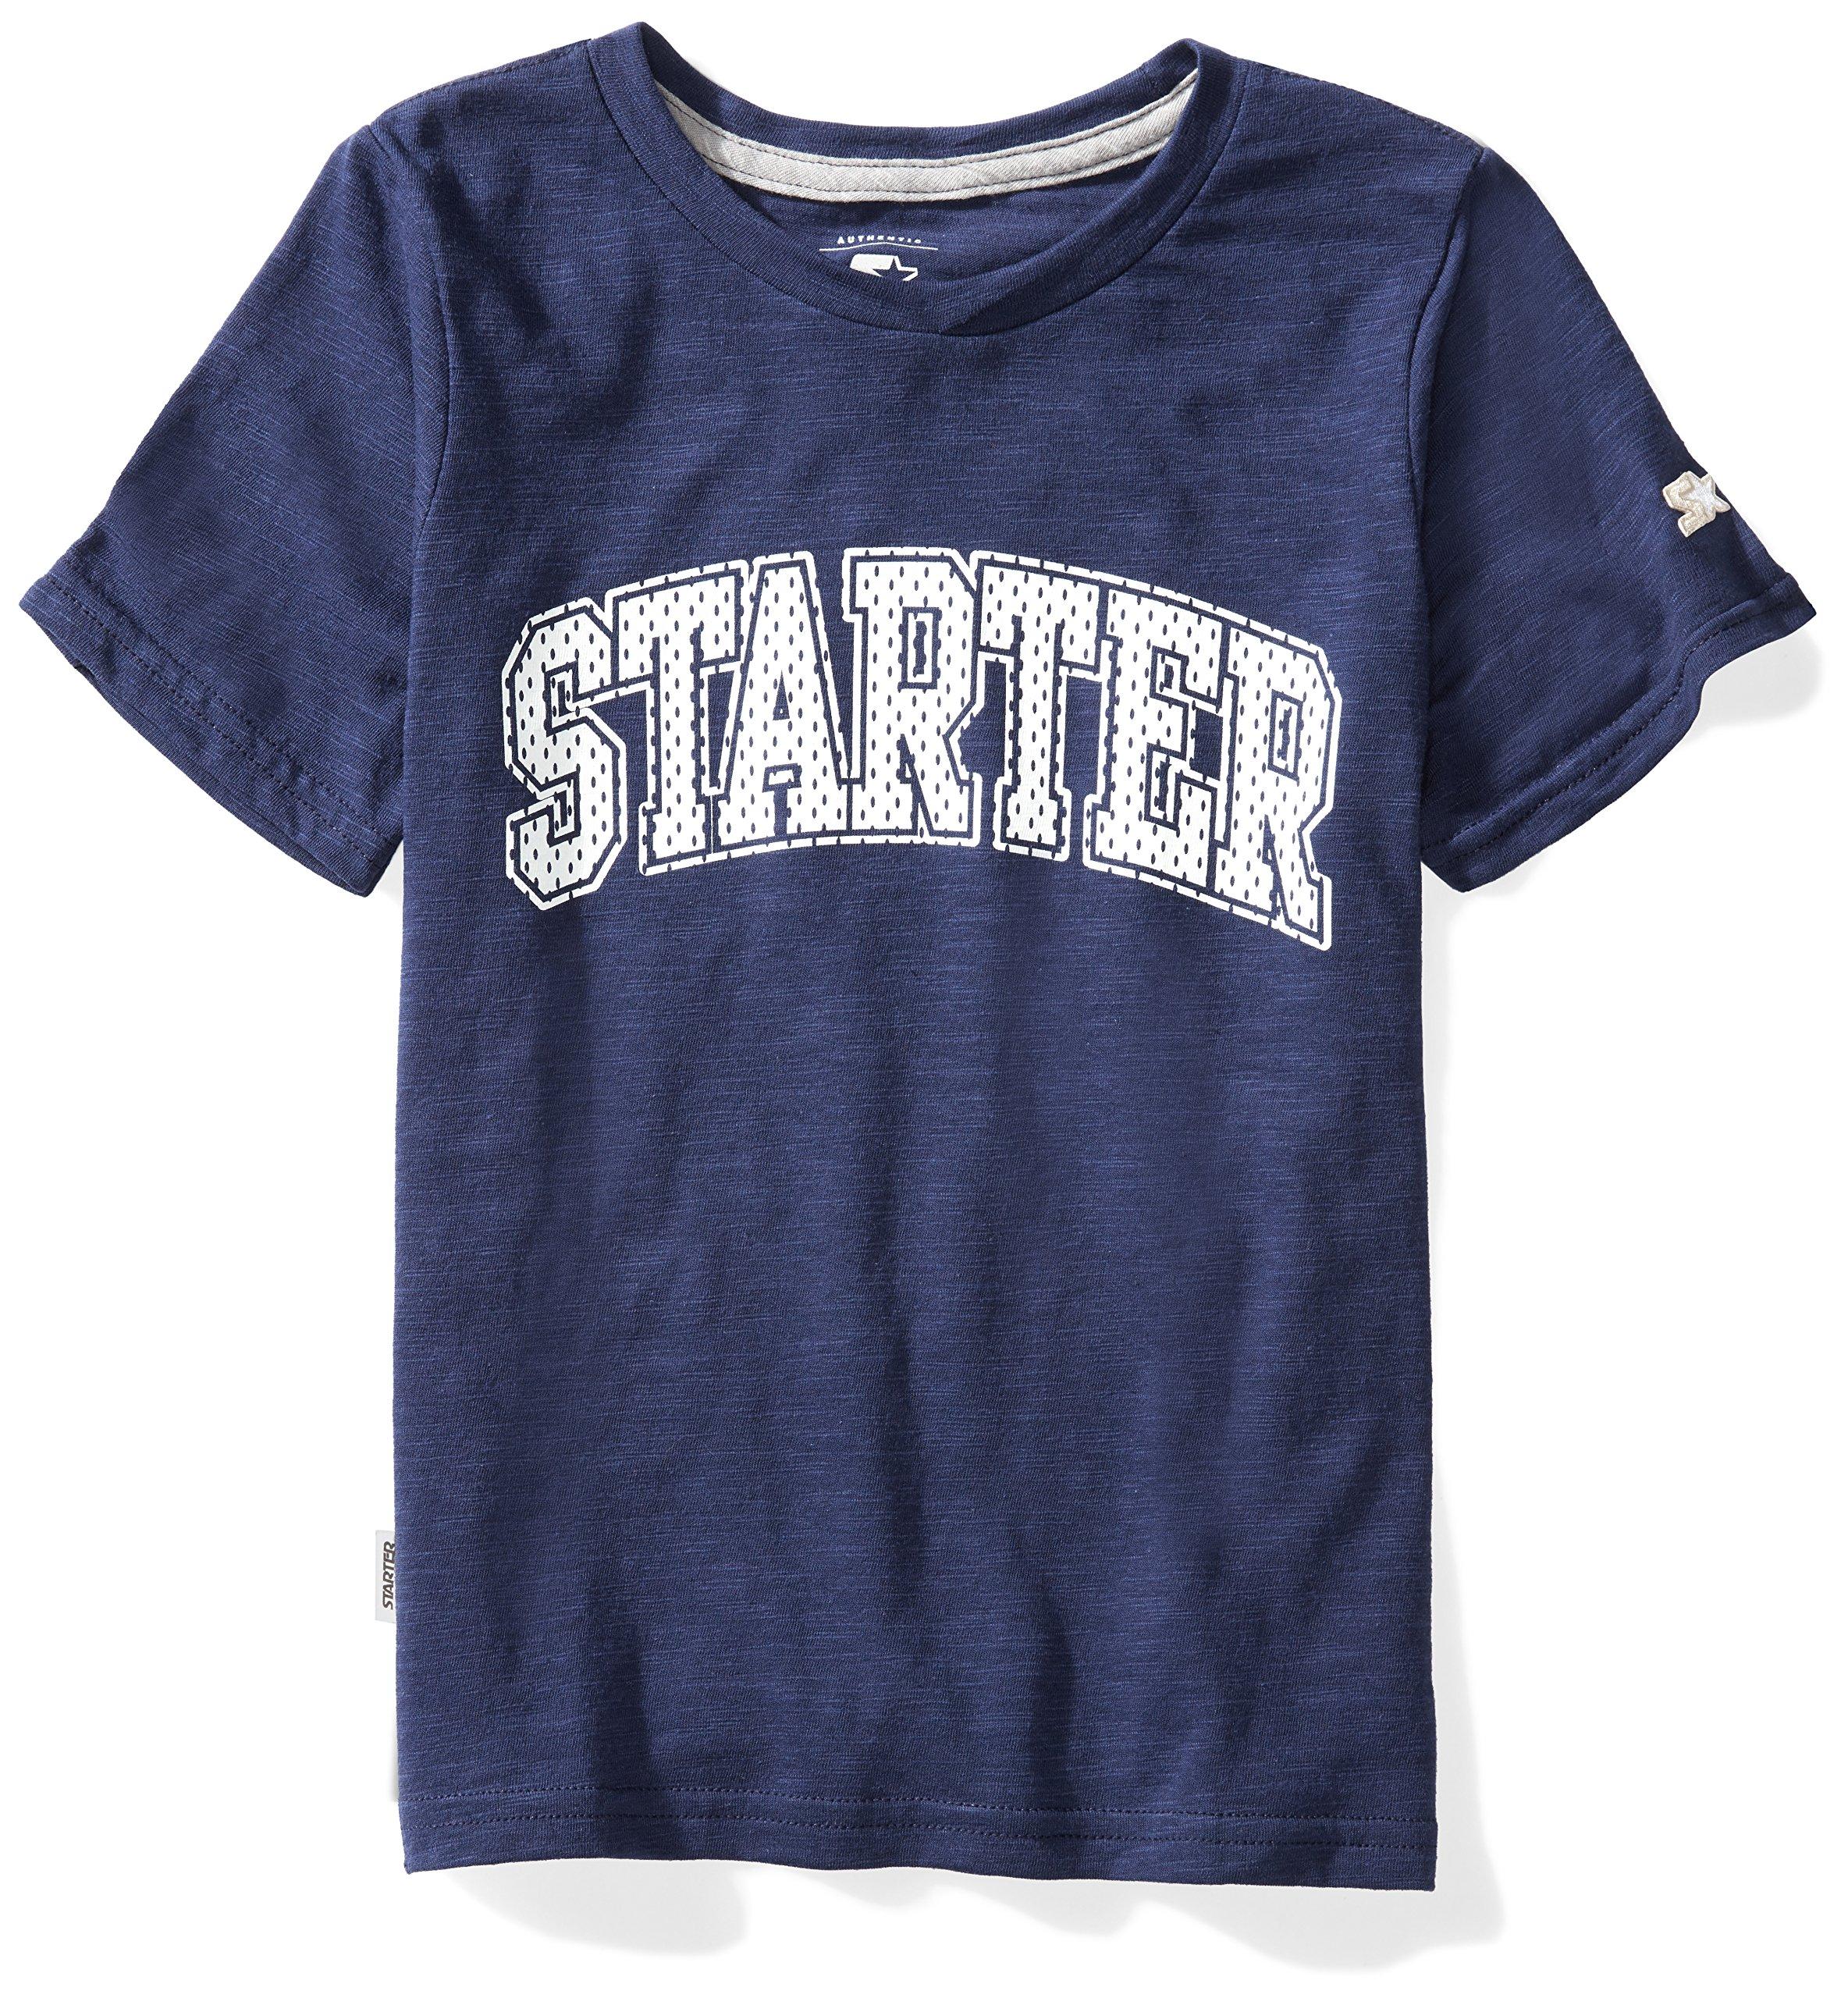 Starter Boys' Short Sleeve Mesh-Logo T-Shirt, Prime Exclusive, Team Navy, XS (4/5)